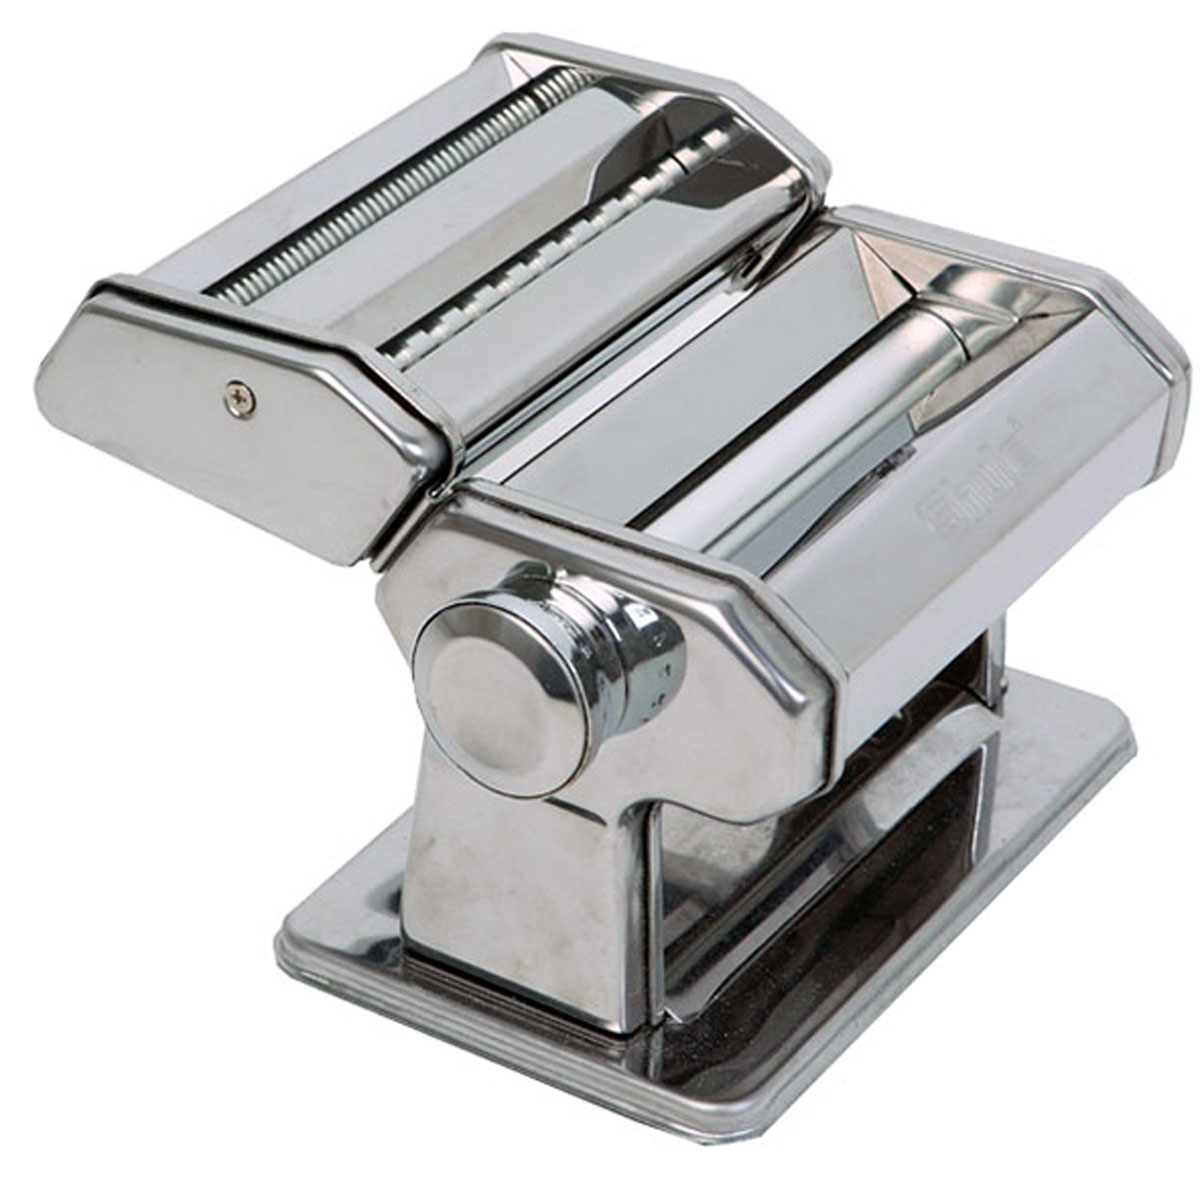 Паста-машина Gemlux GL-PMF-180, Silver